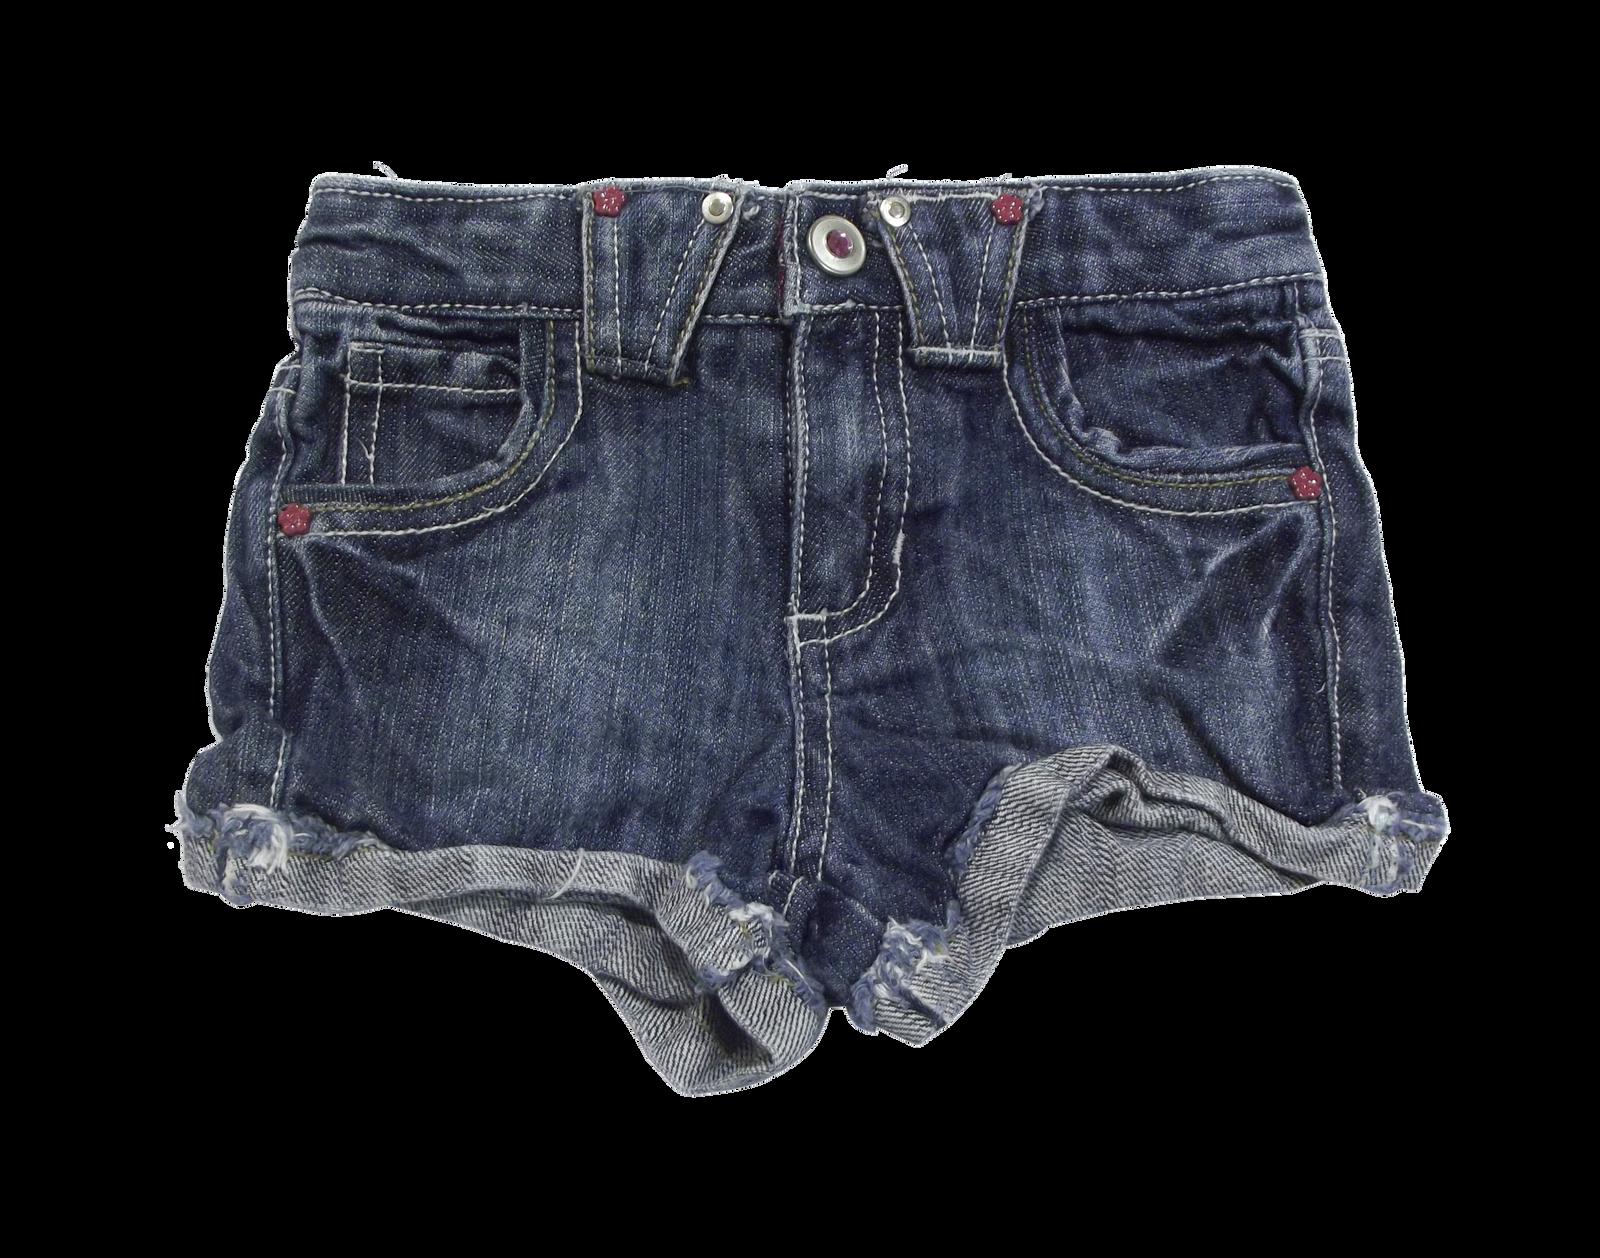 jean shorts clip art denim shorts hot girls wallpaper